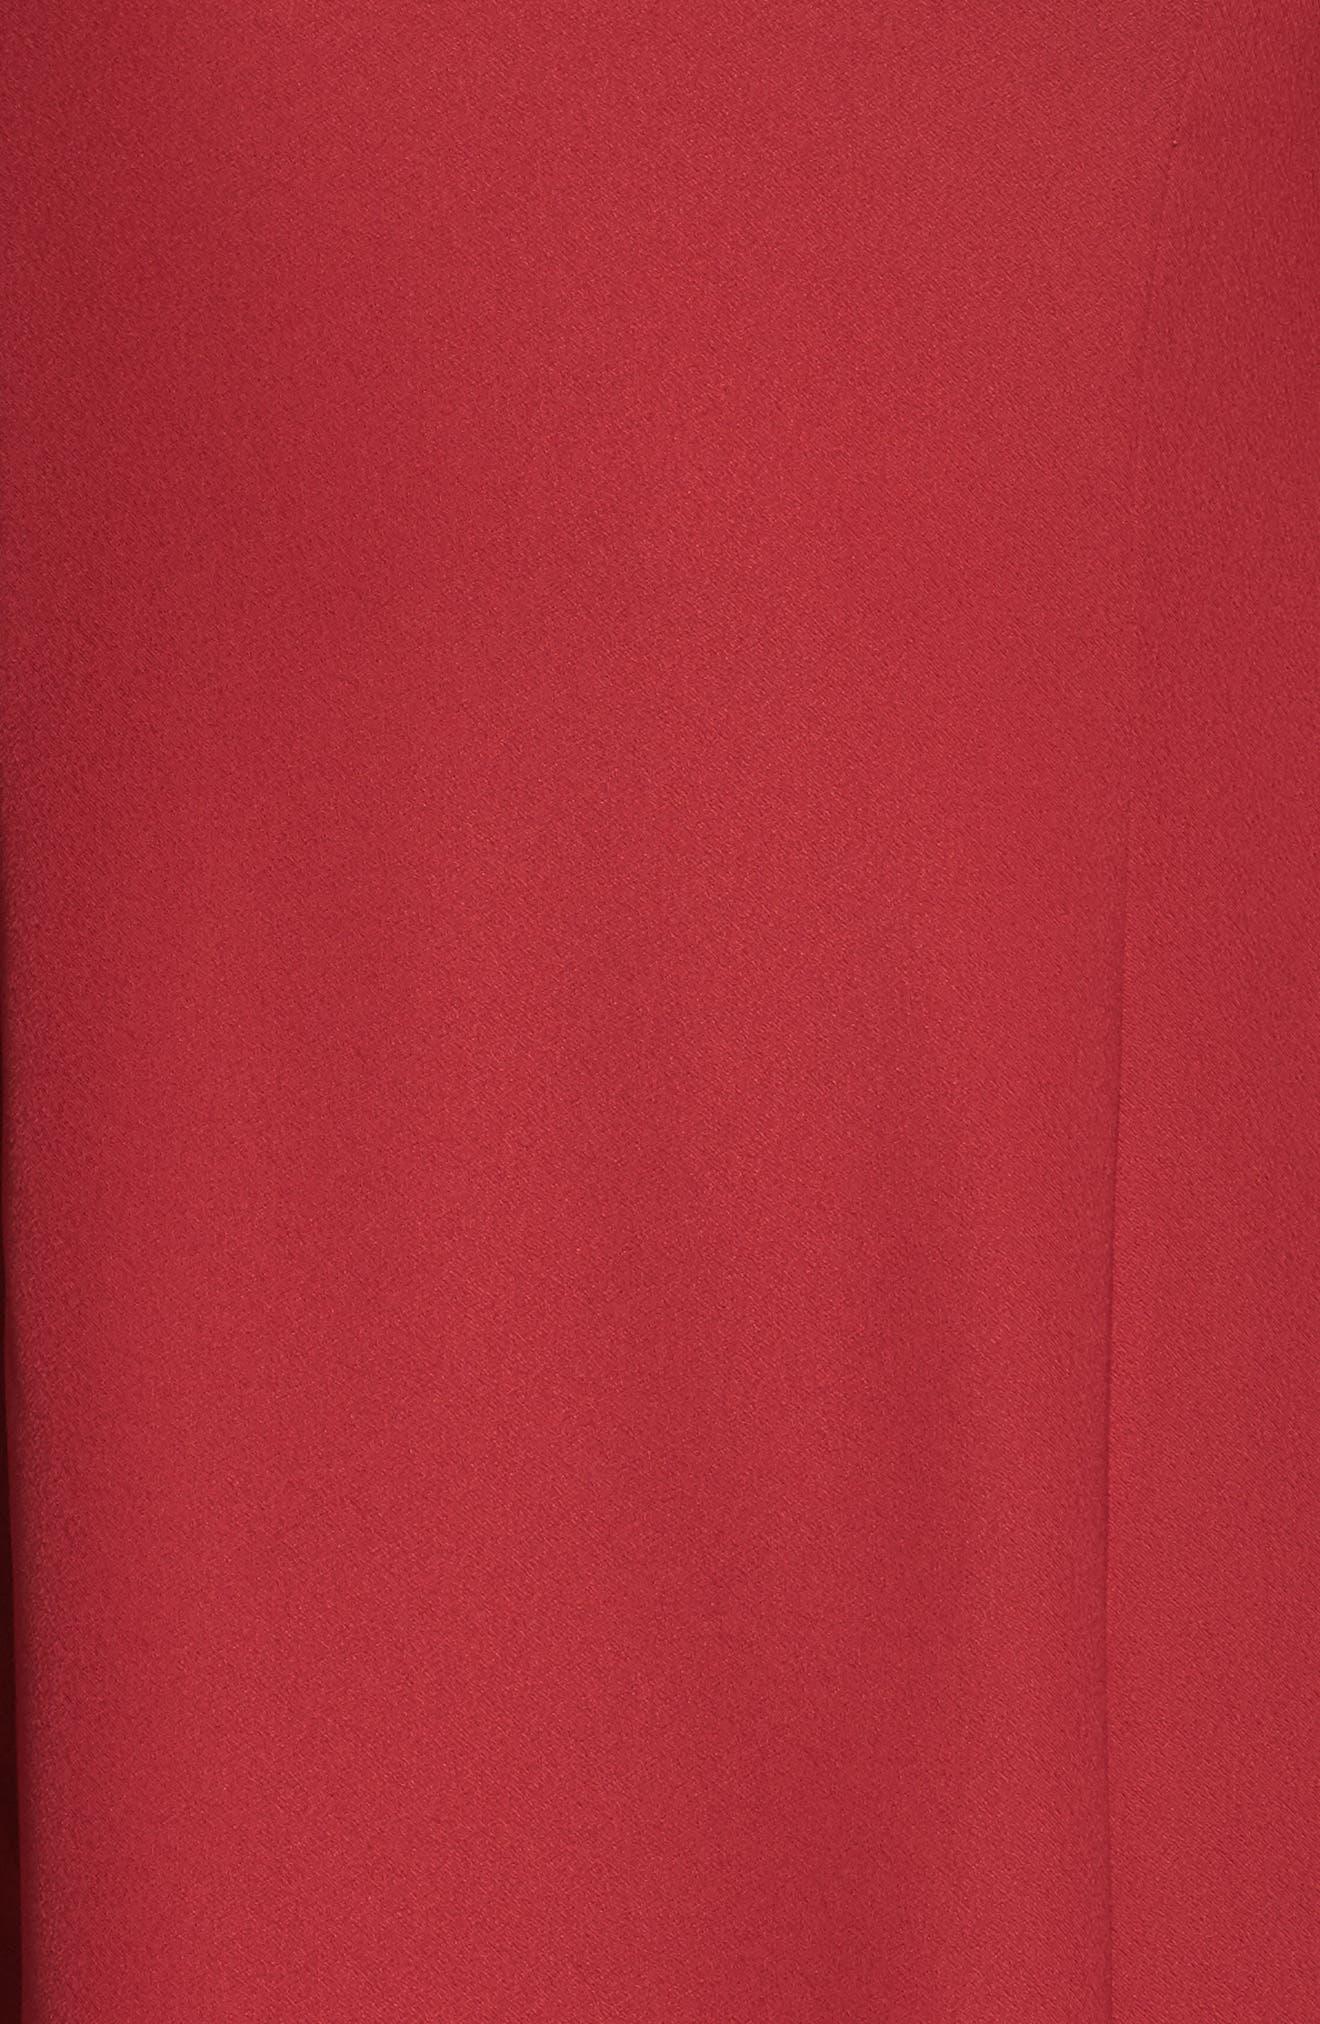 Bell Sleeve A-Line Dress,                             Alternate thumbnail 10, color,